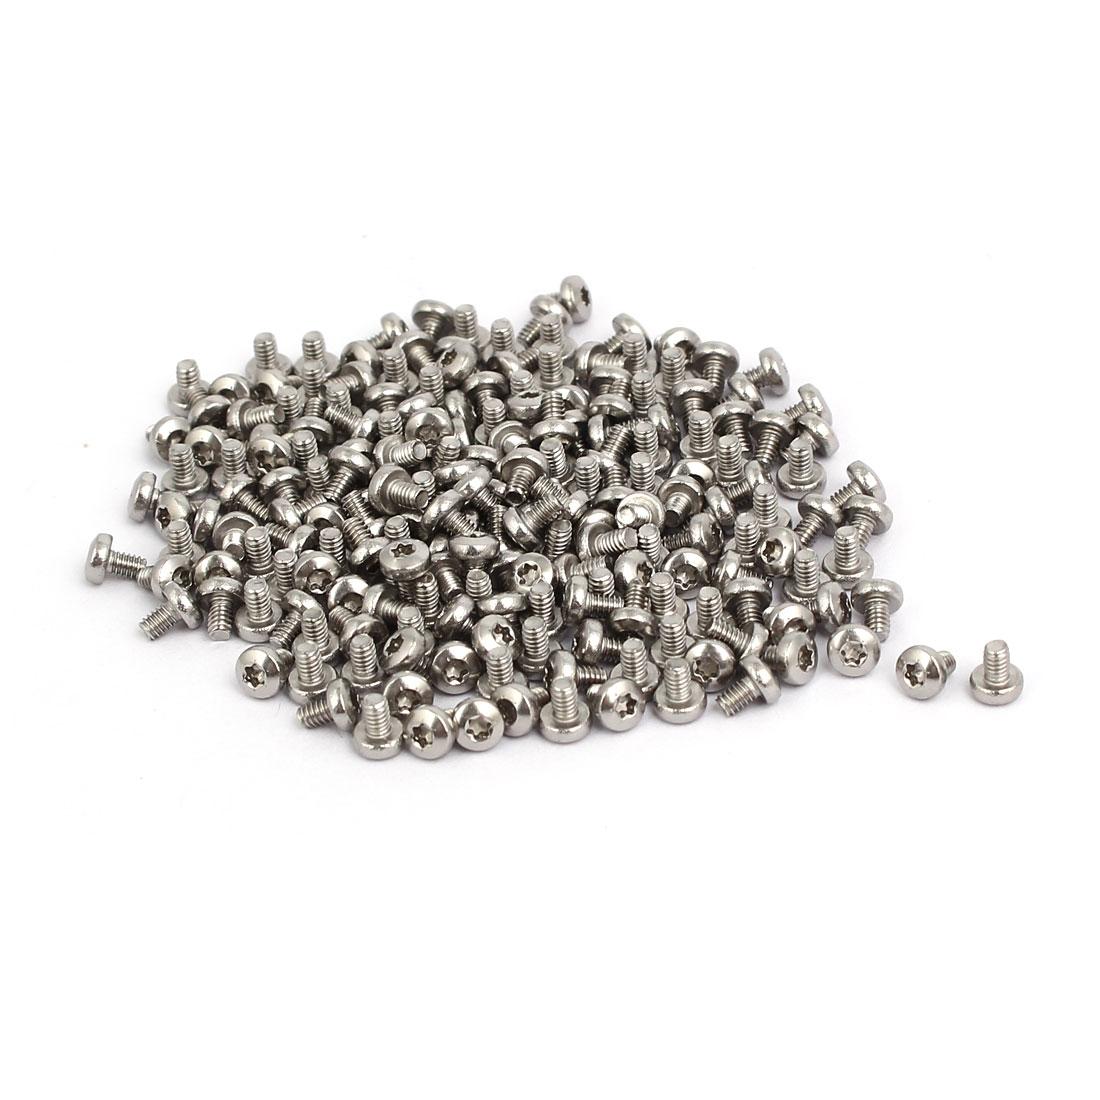 M2x3mm 304 Stainless Steel Button Head Torx Screws Fasteners 200pcs